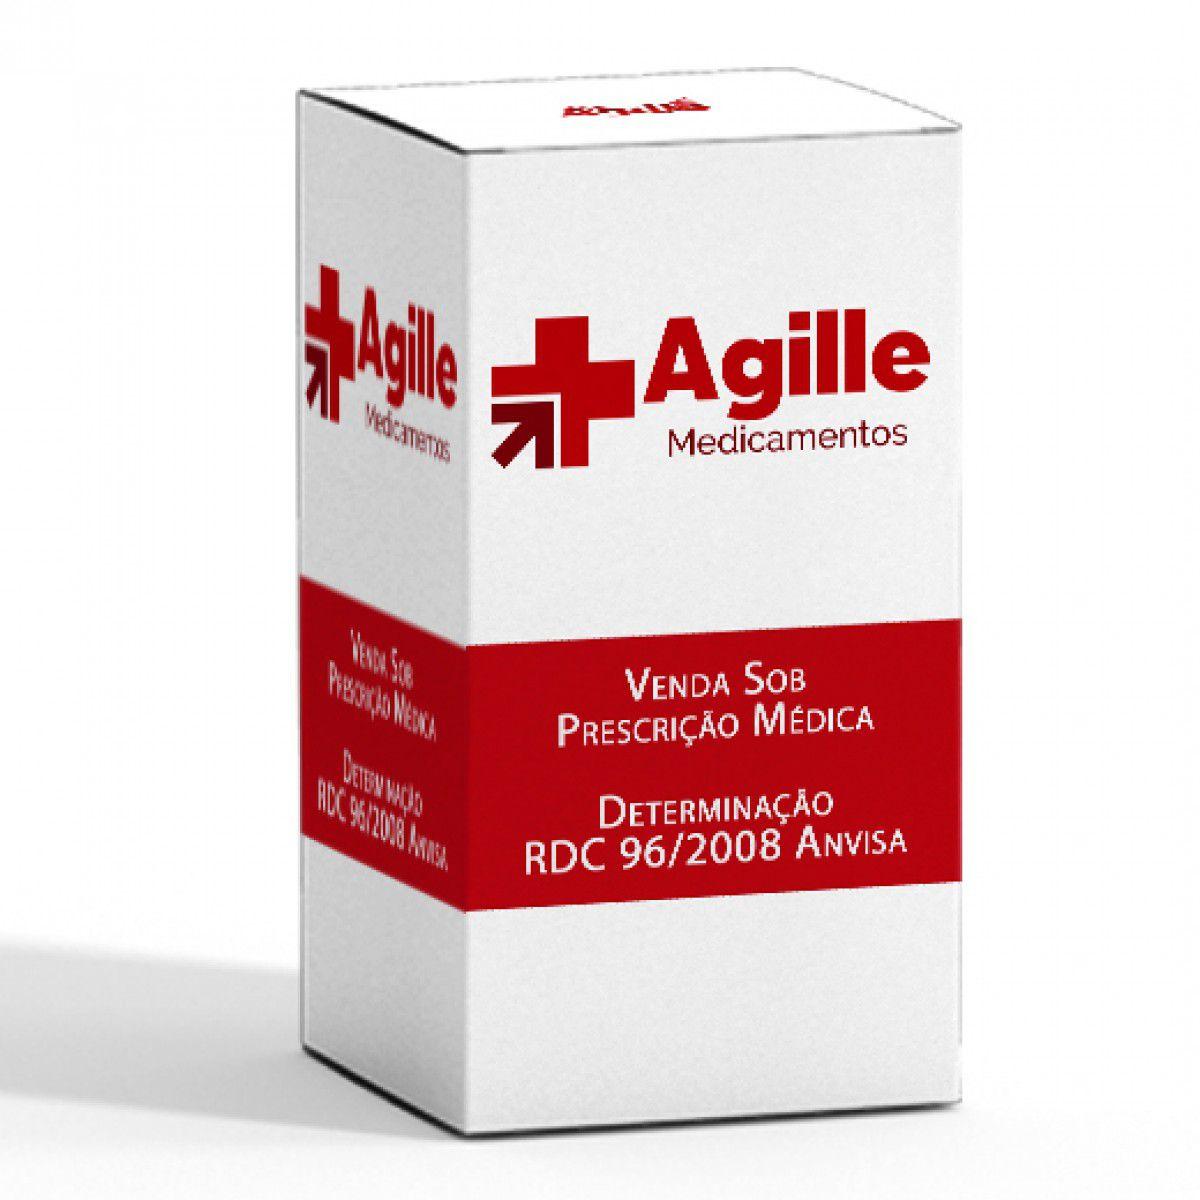 FIRMAGON 80mg po liof inj 1fa+1dil x 4,2ml+1agu.da  - Agille Speciality